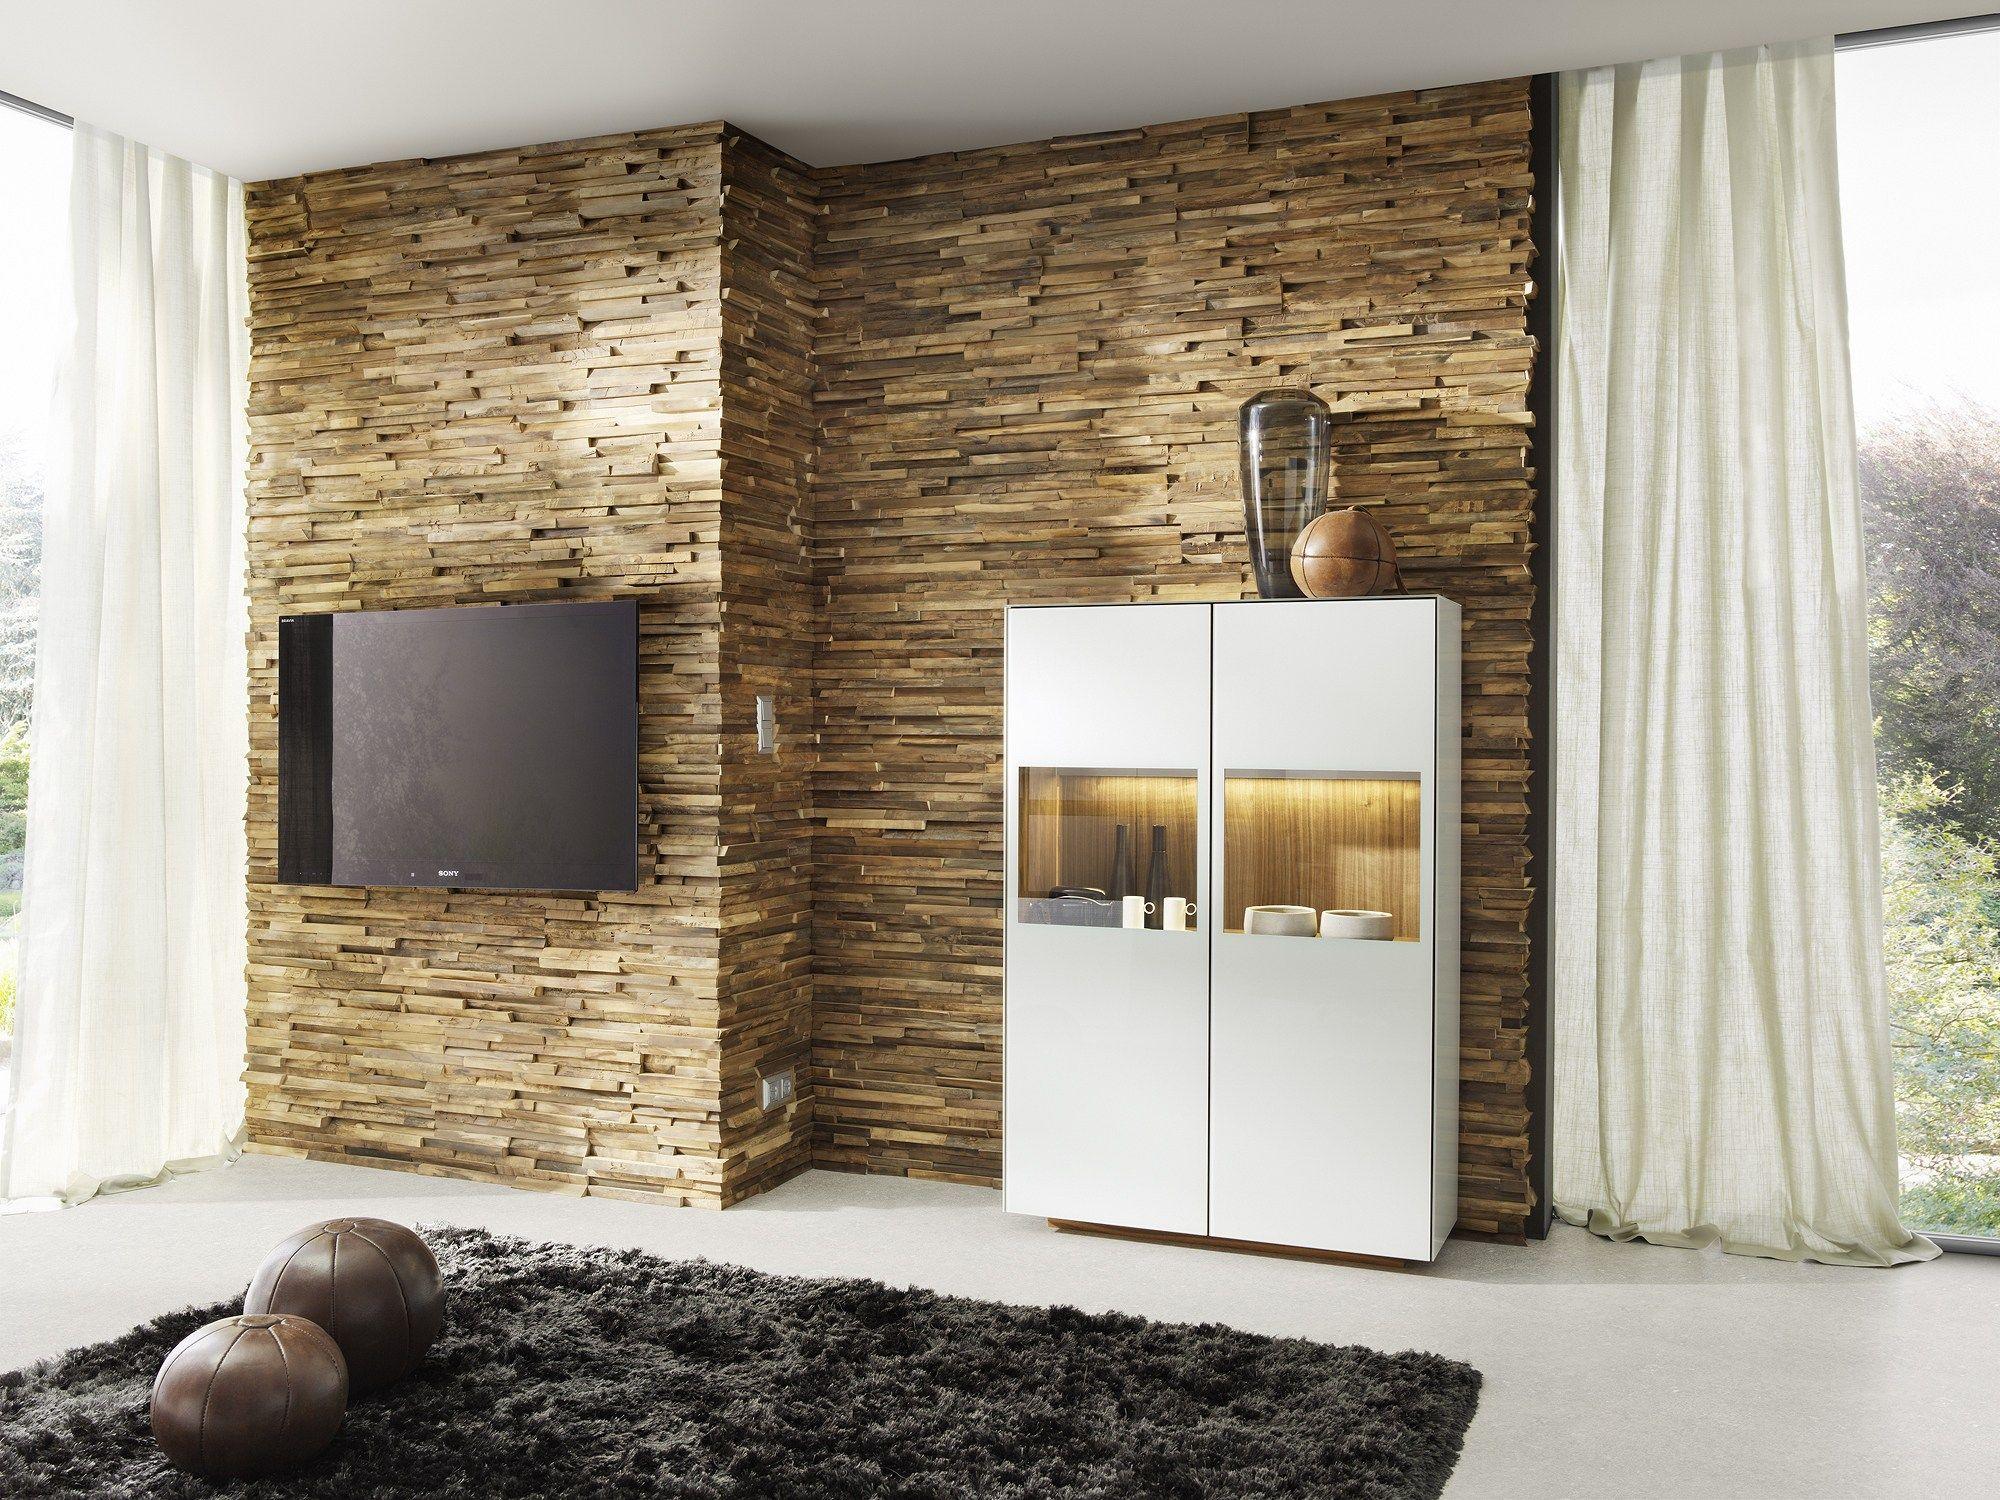 Revestimiento de pared 3d de madera maciza para interiores - Revestimiento de pared ...